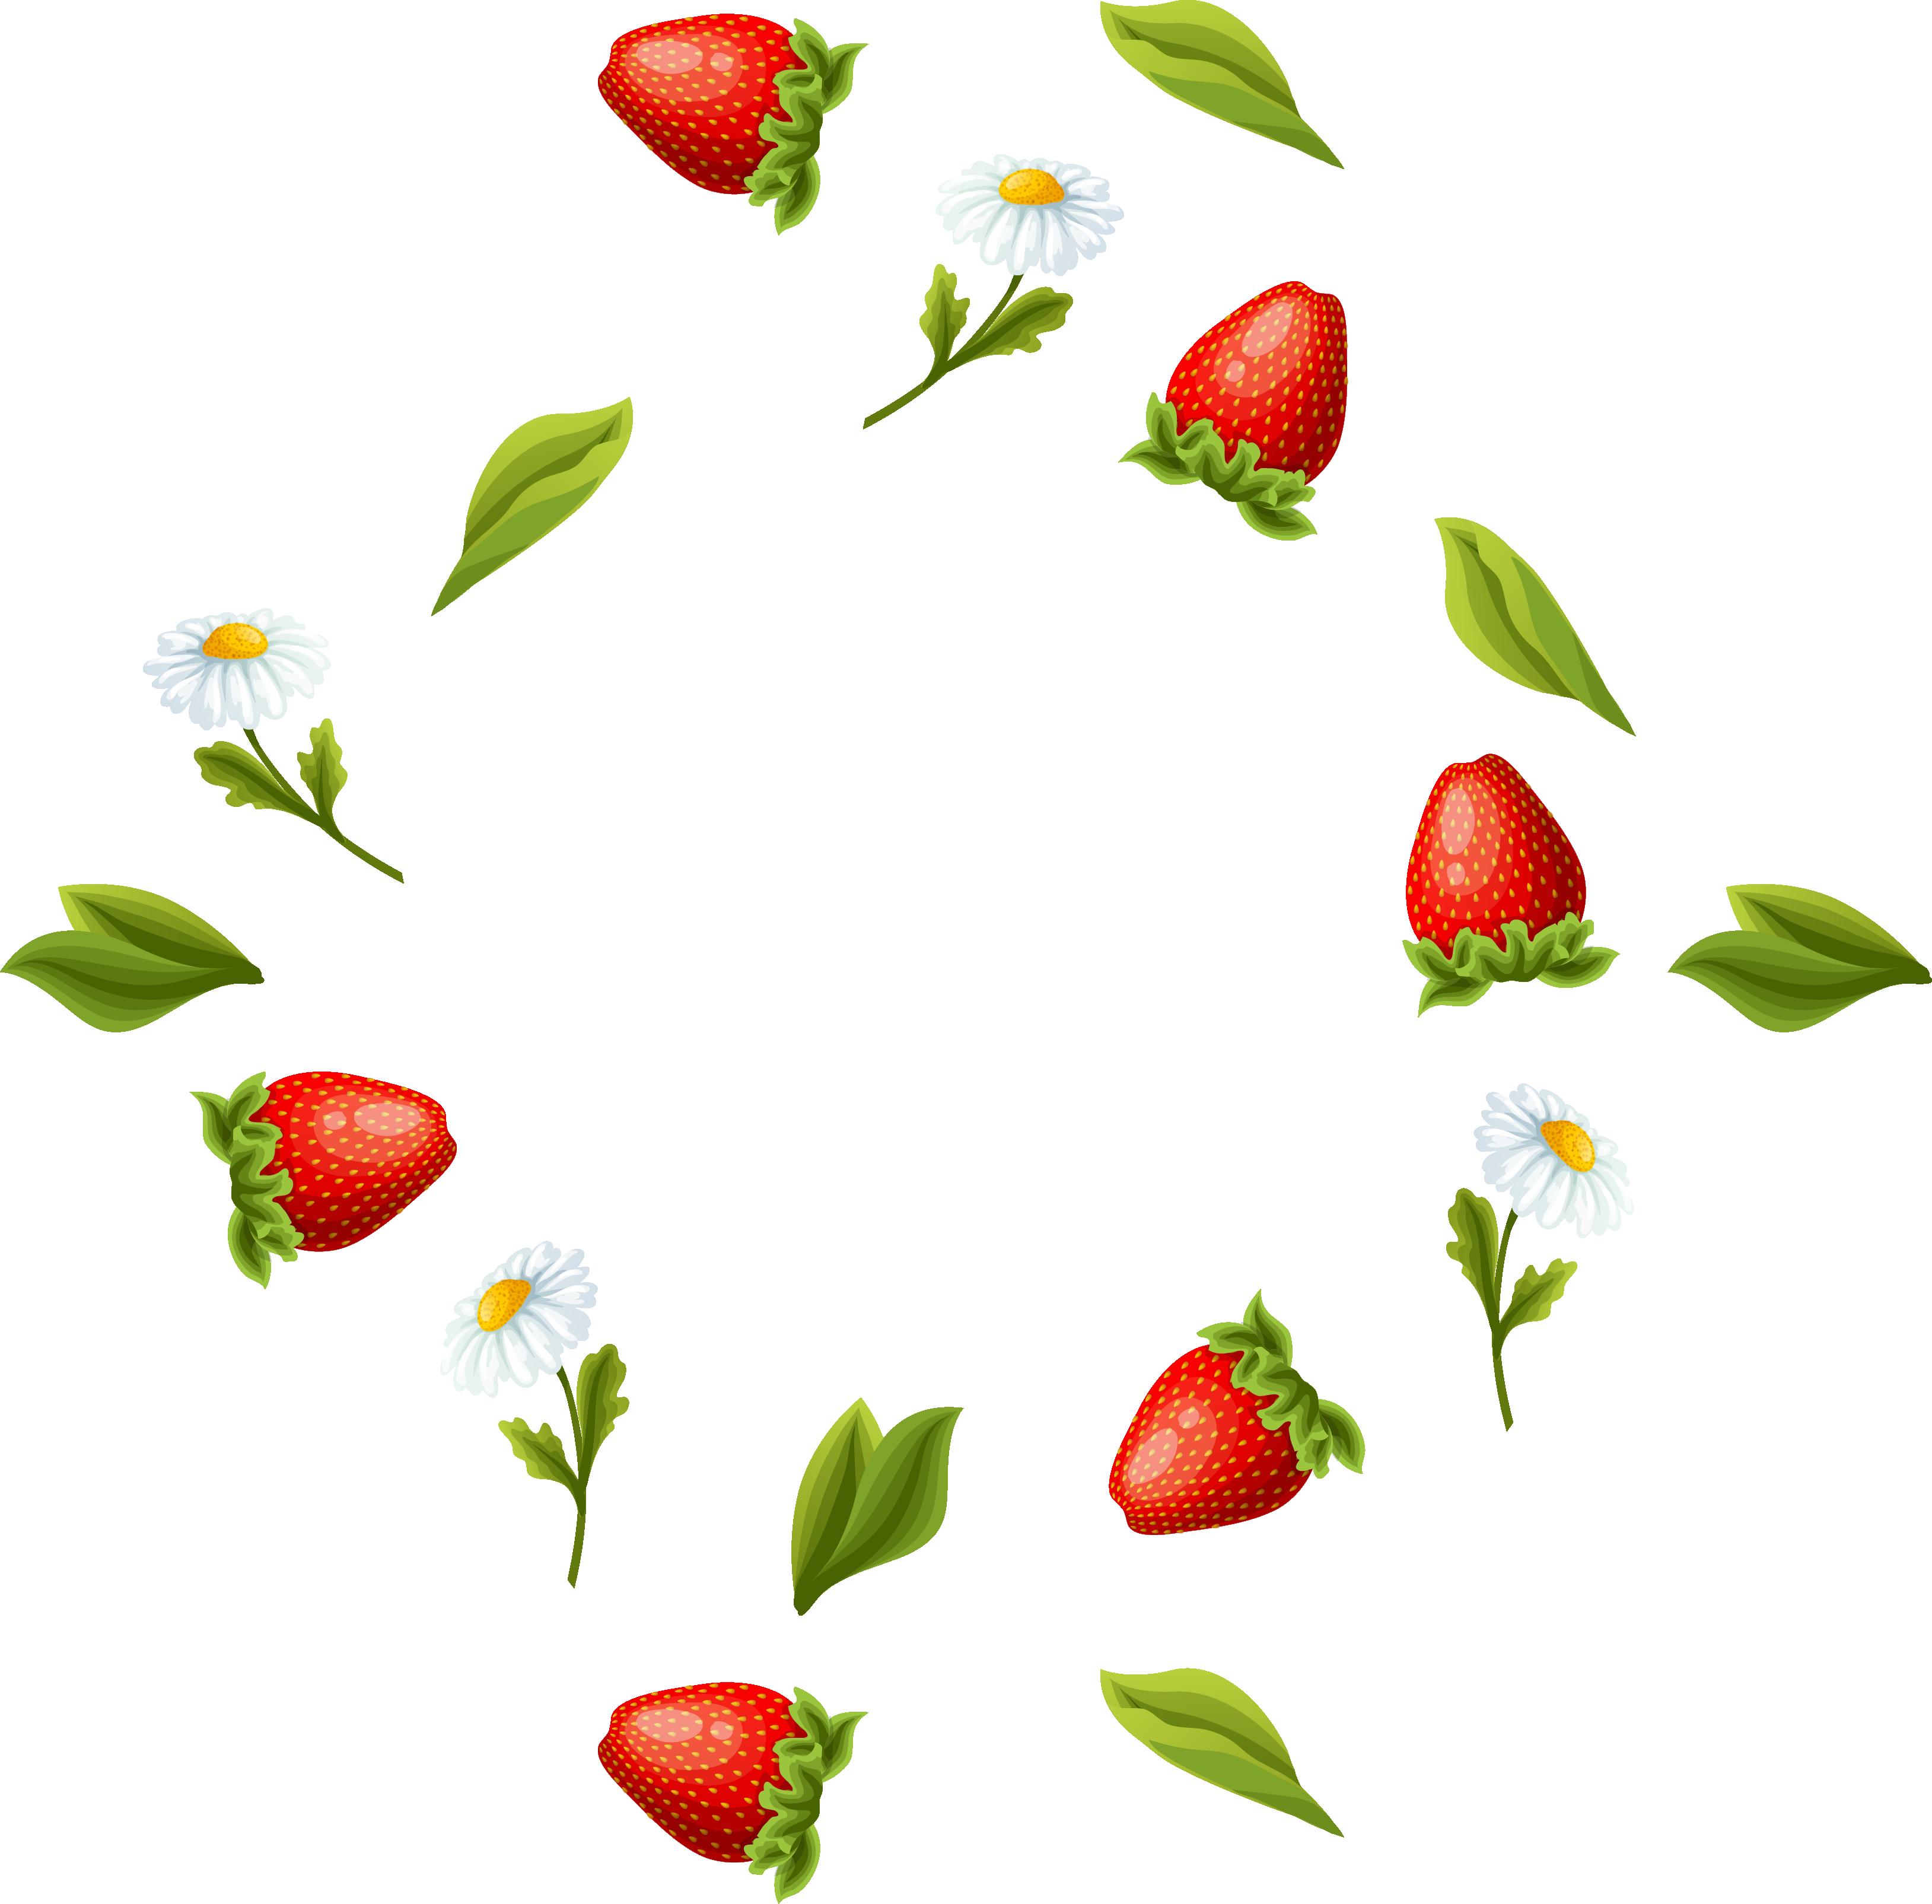 Gelatin dessert marmalade fruit. Strawberries clipart strawberry leave